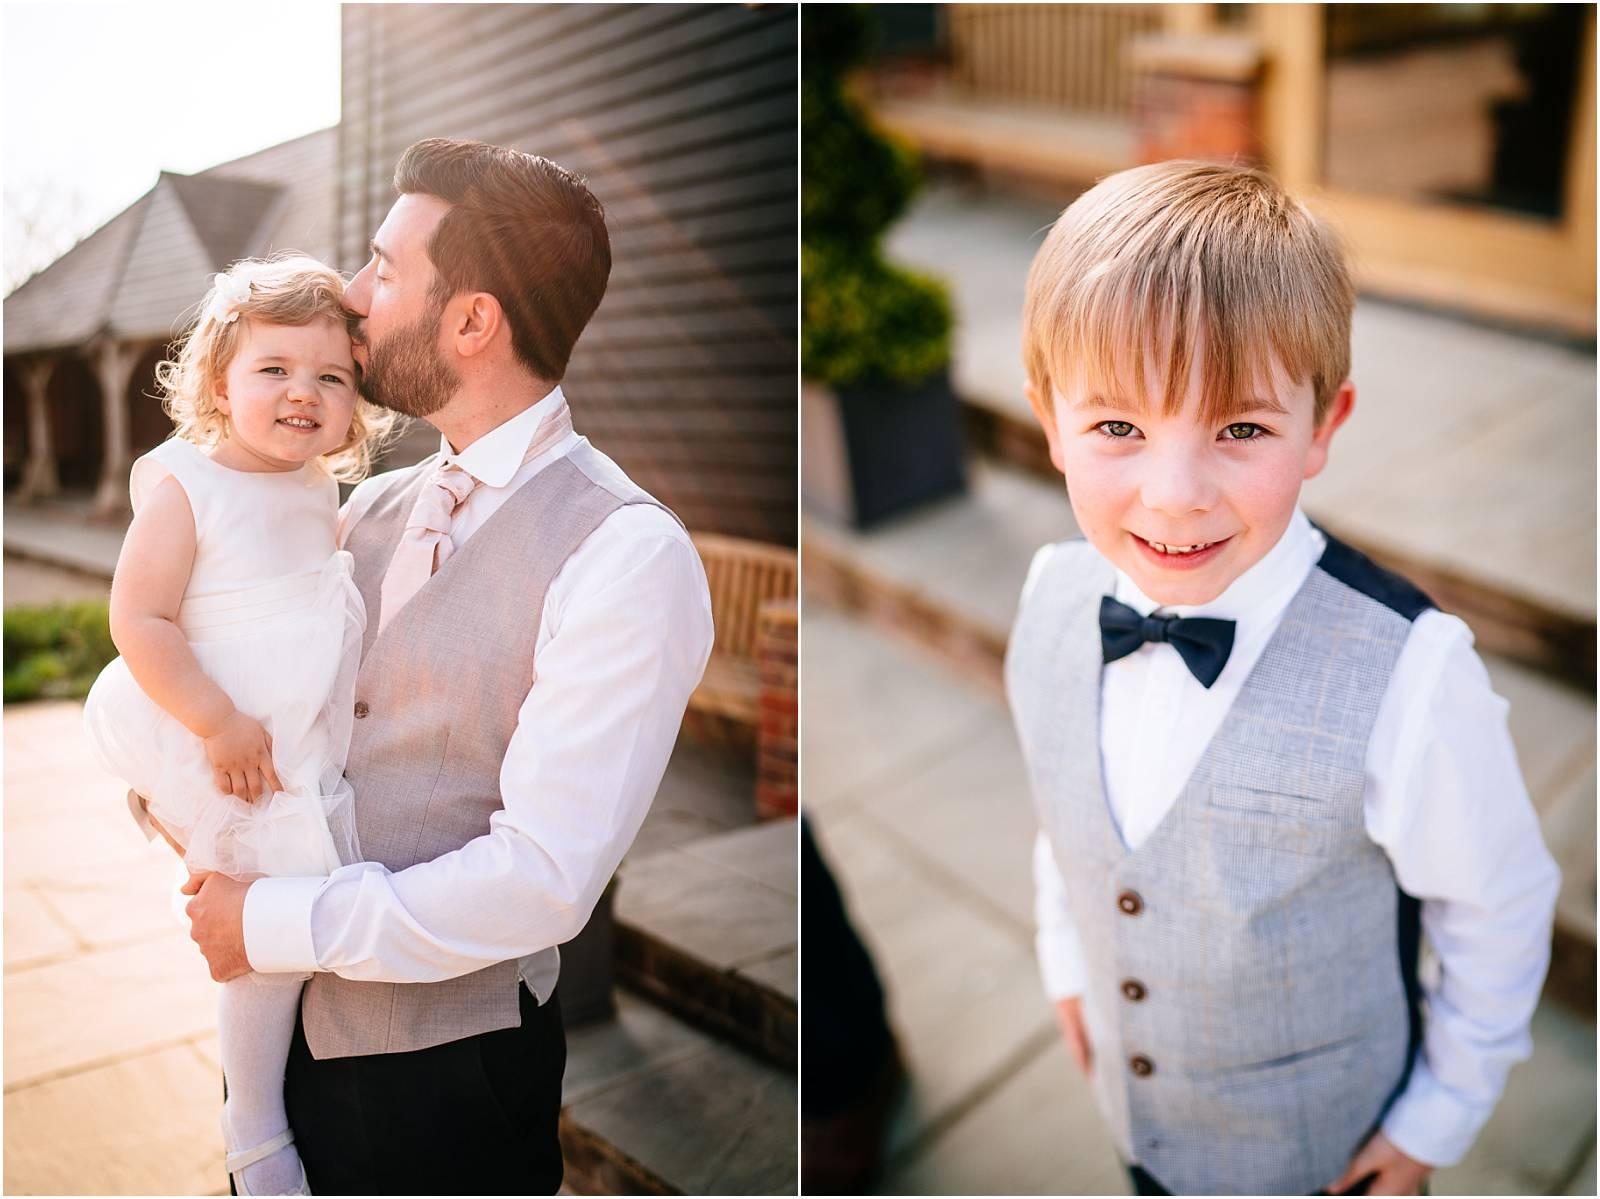 kids at wedding in golden hour